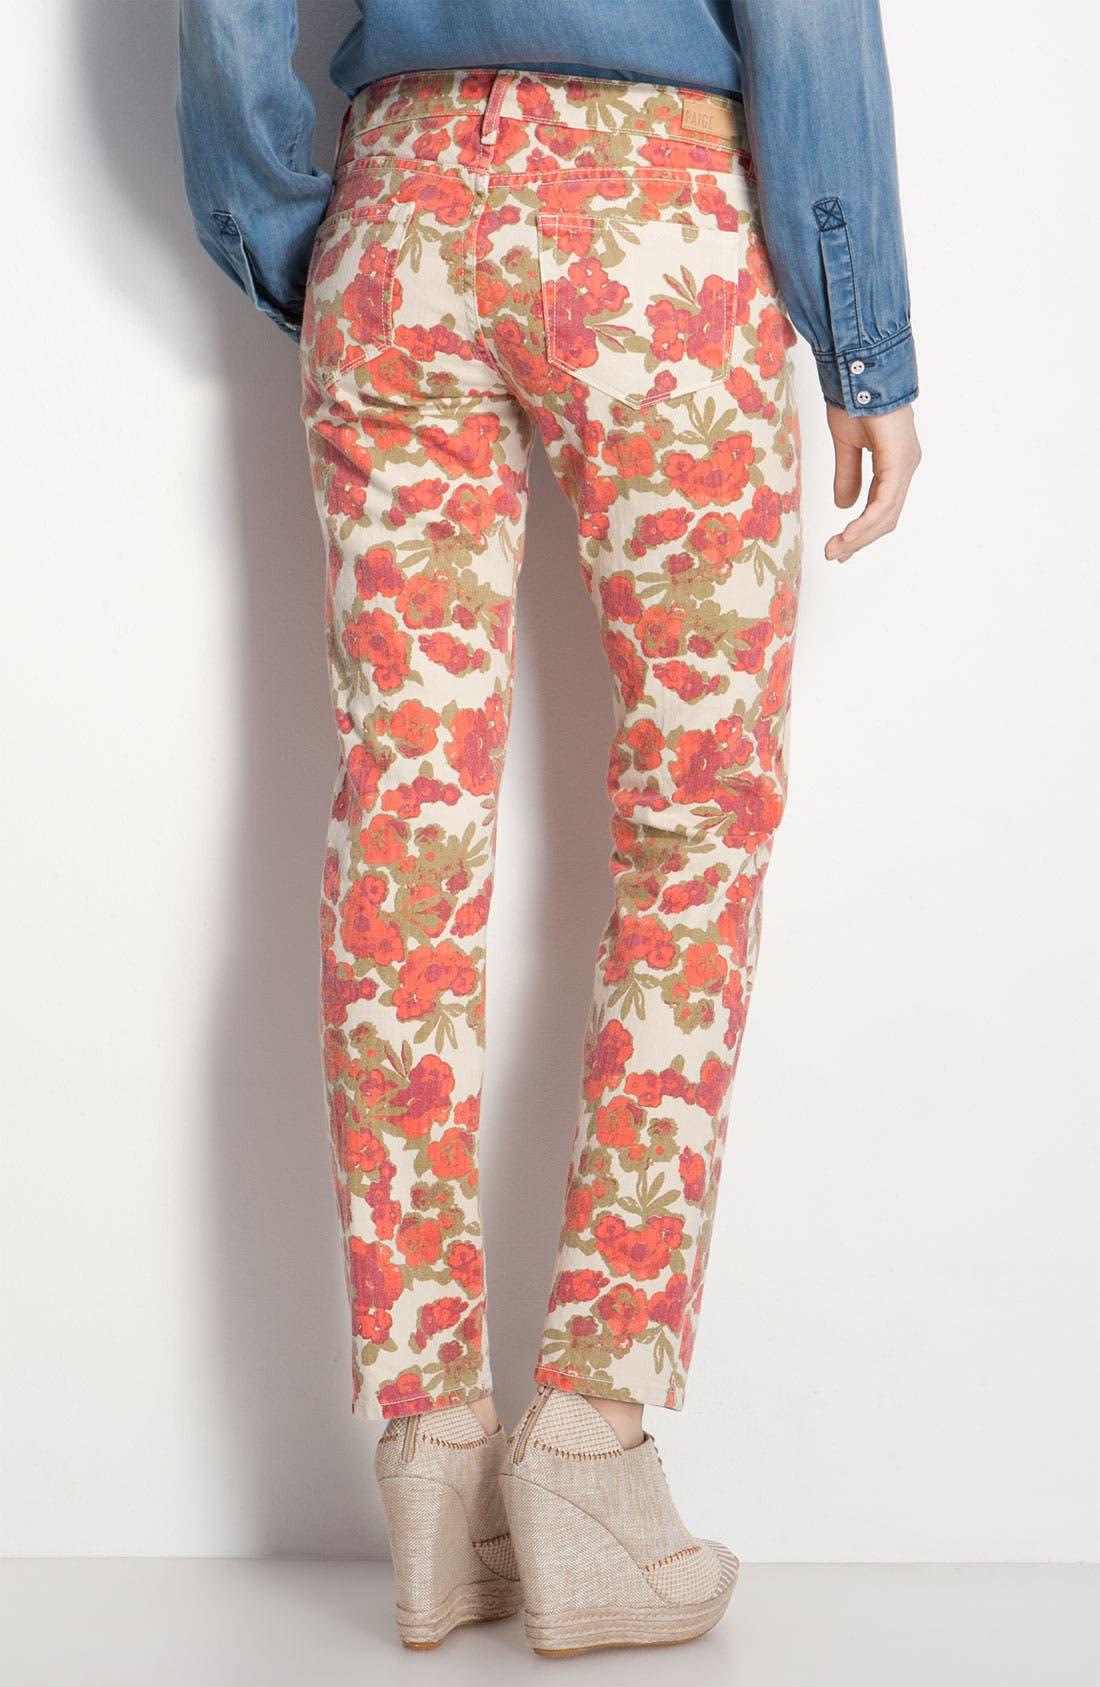 Main Image - Paige Denim 'Skyline' Floral Skinny Ankle Jeans (Chello Ivory Print)